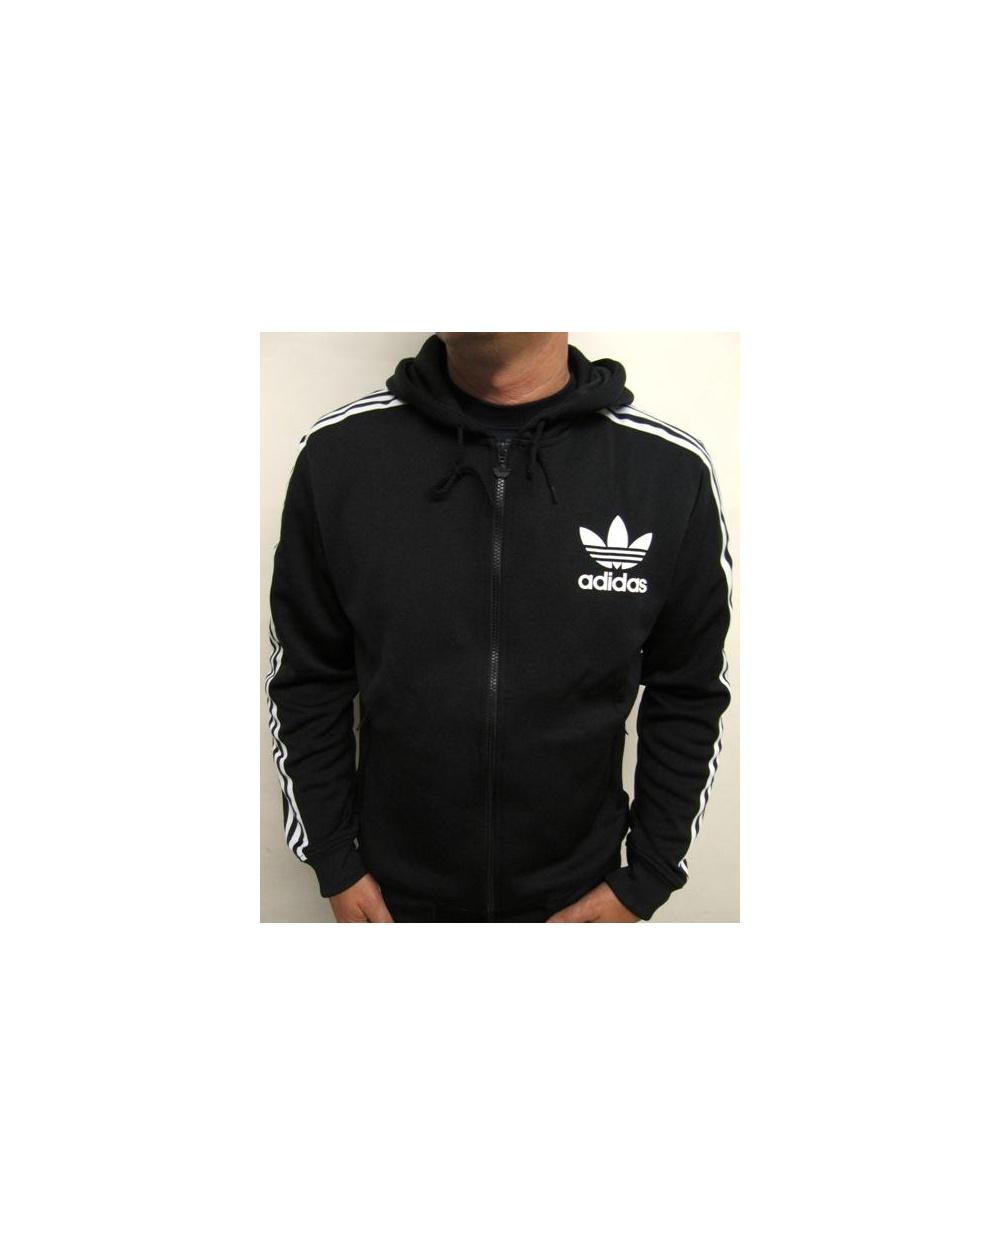 Addias hoodies